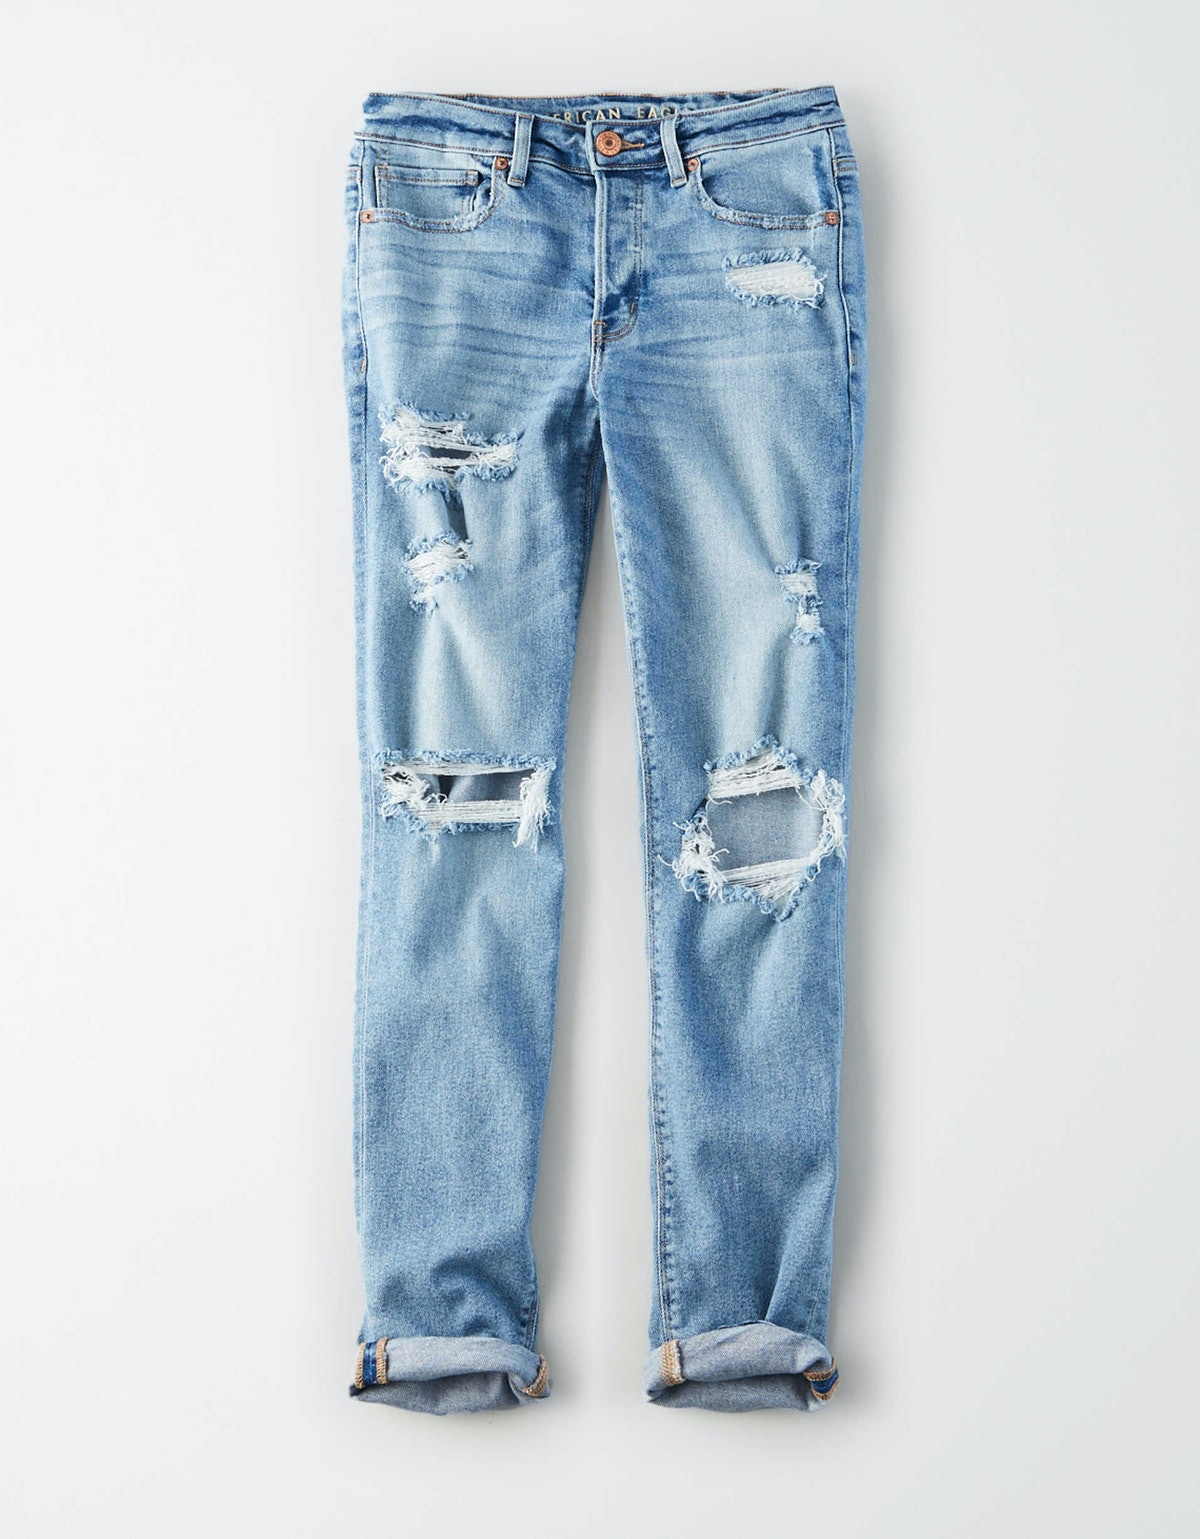 Stretch Tomgirl Jeans in Slashed Sky